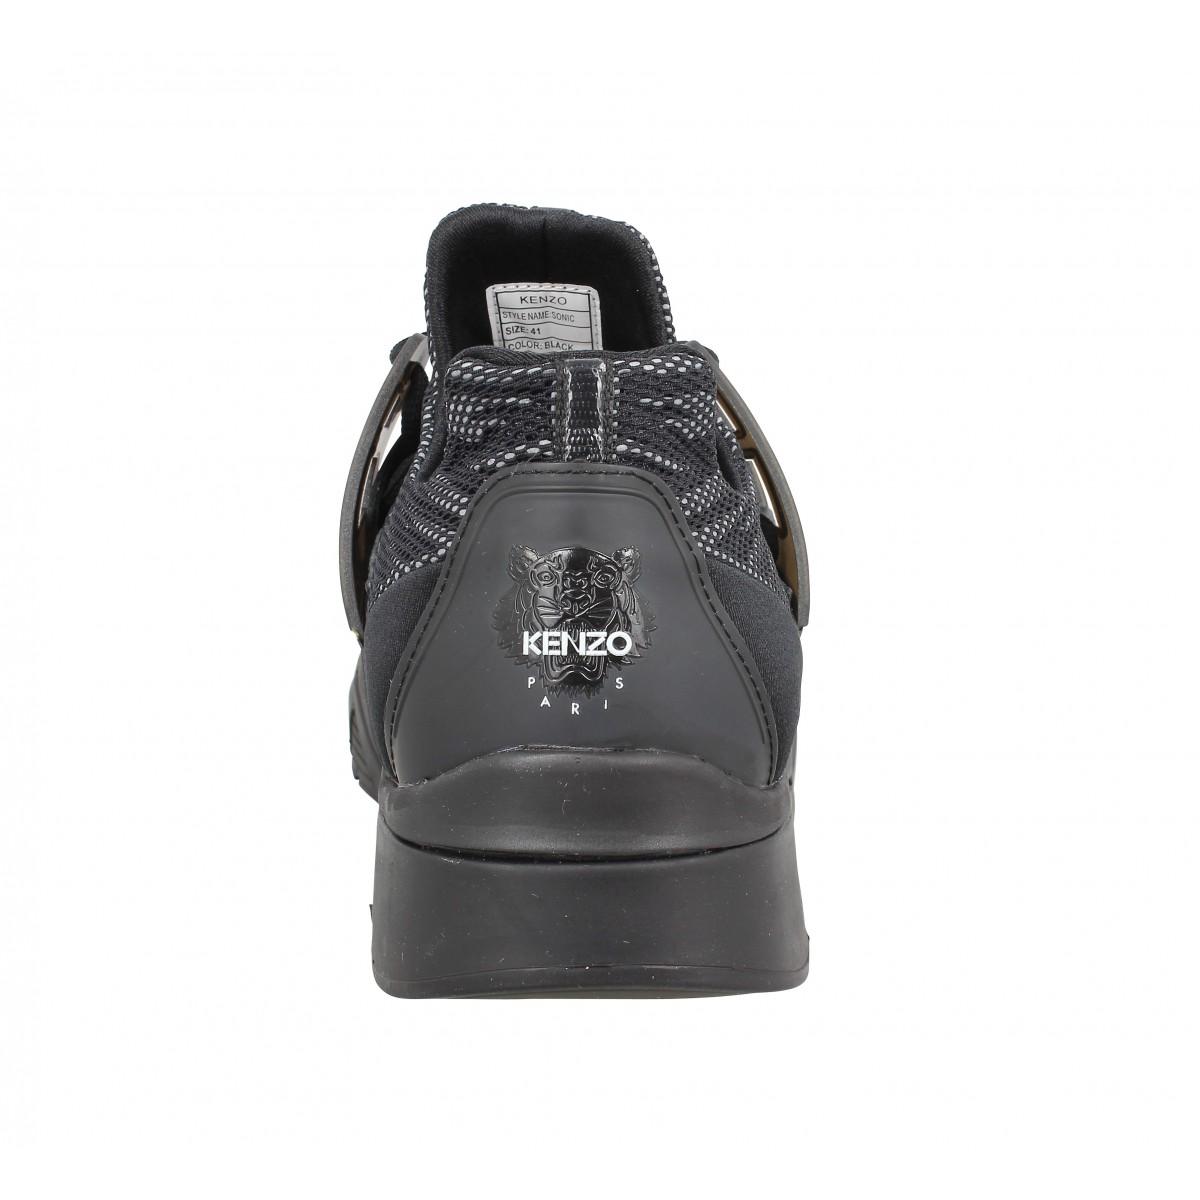 Pour Promot Fanny Chaussures Tzxcfert-120602-5500771 Yet Not Vulgar Kenzo Sonic Noir Homme